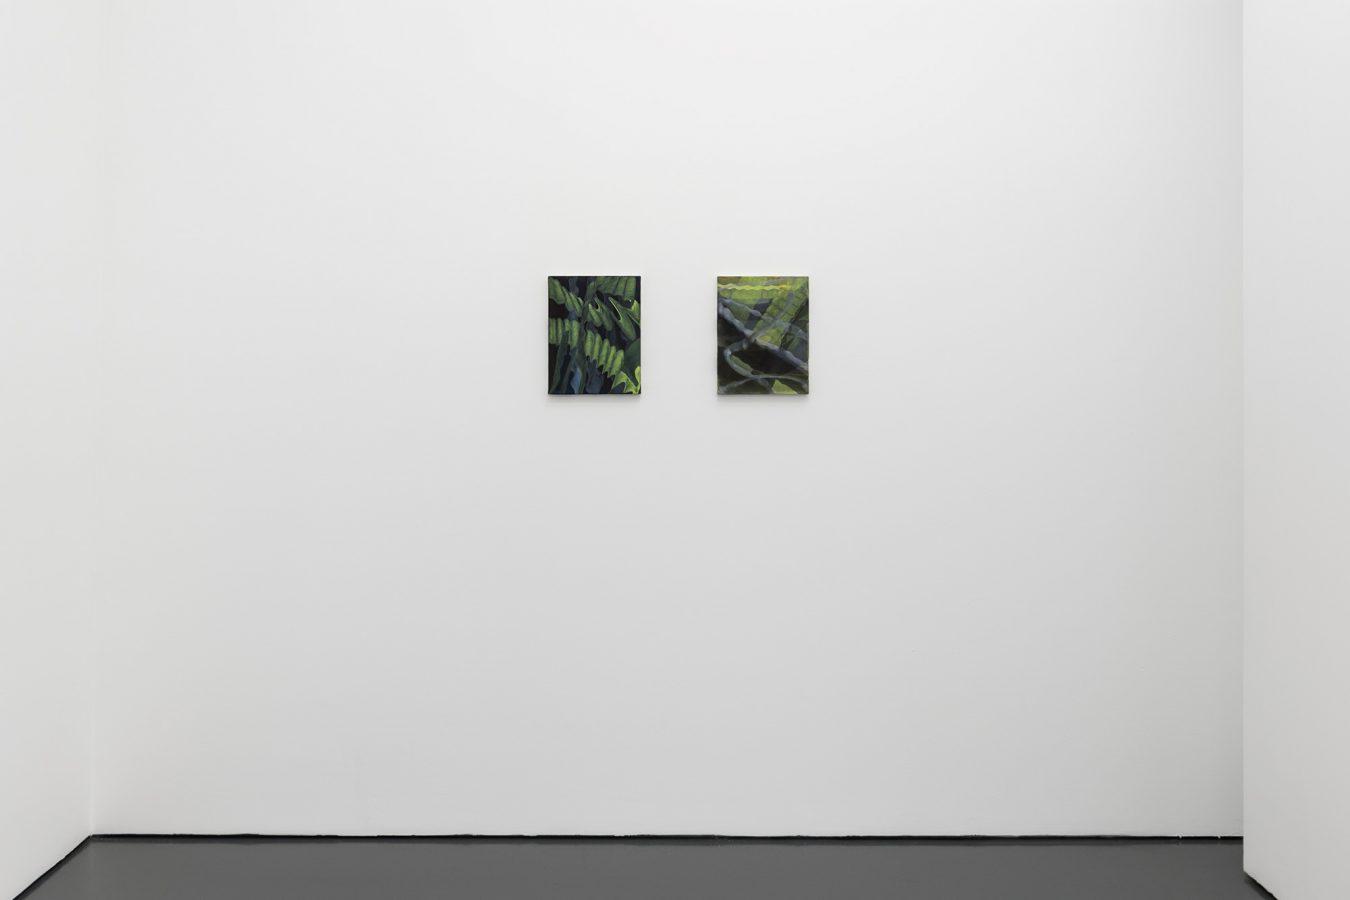 Galeria Pedro Cera – Ana Manso - Z